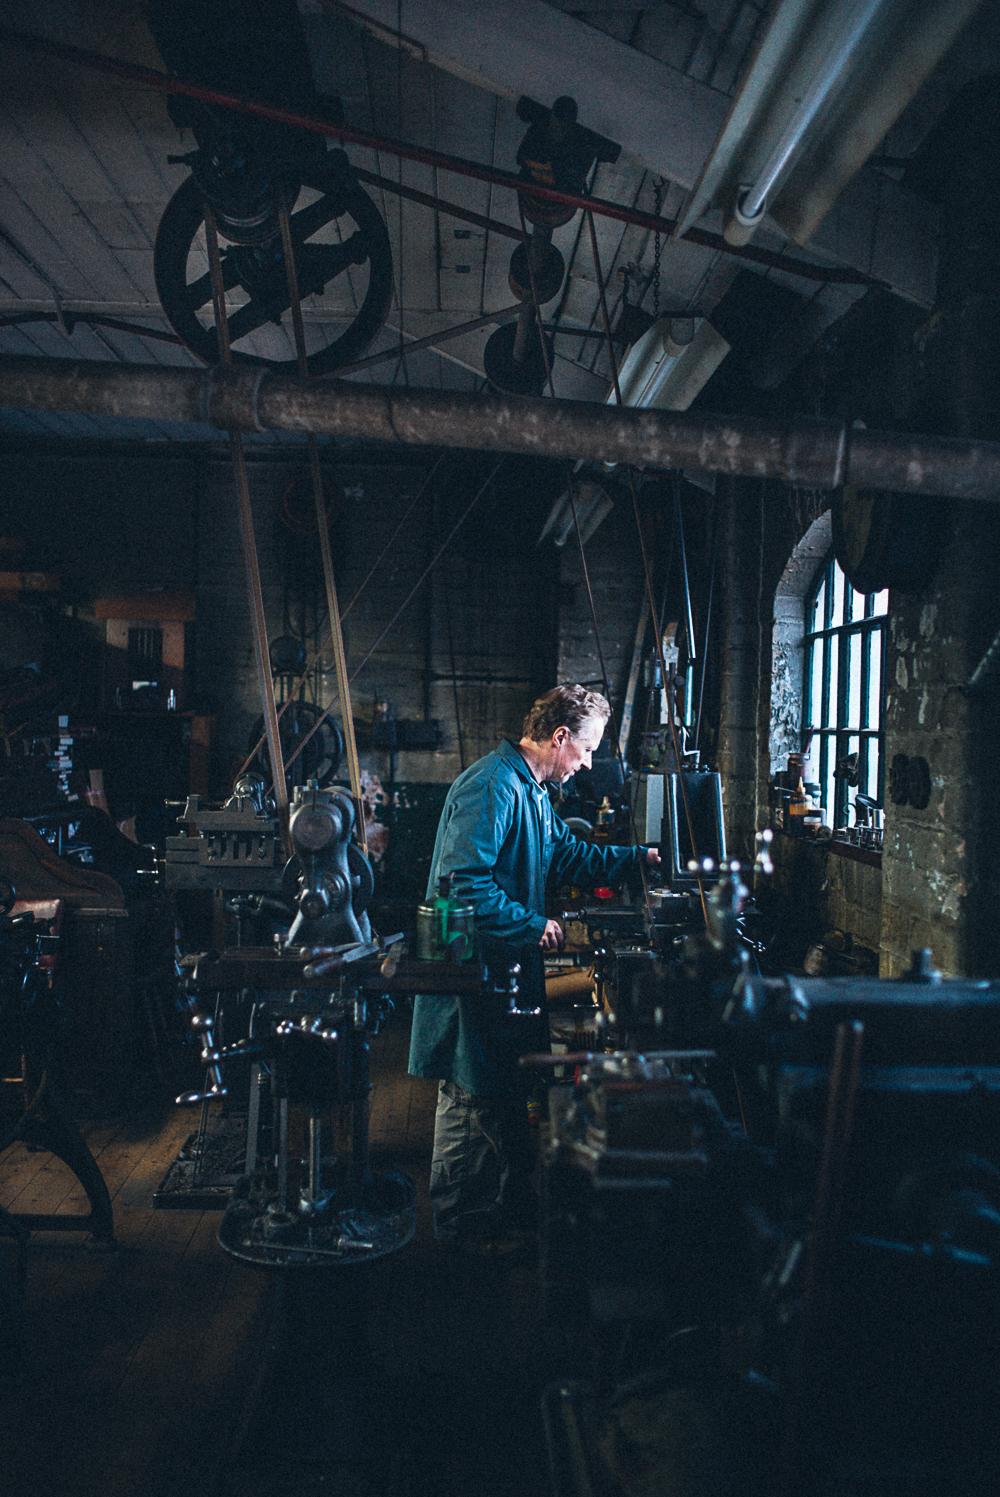 The Workshop of Hayden Hill